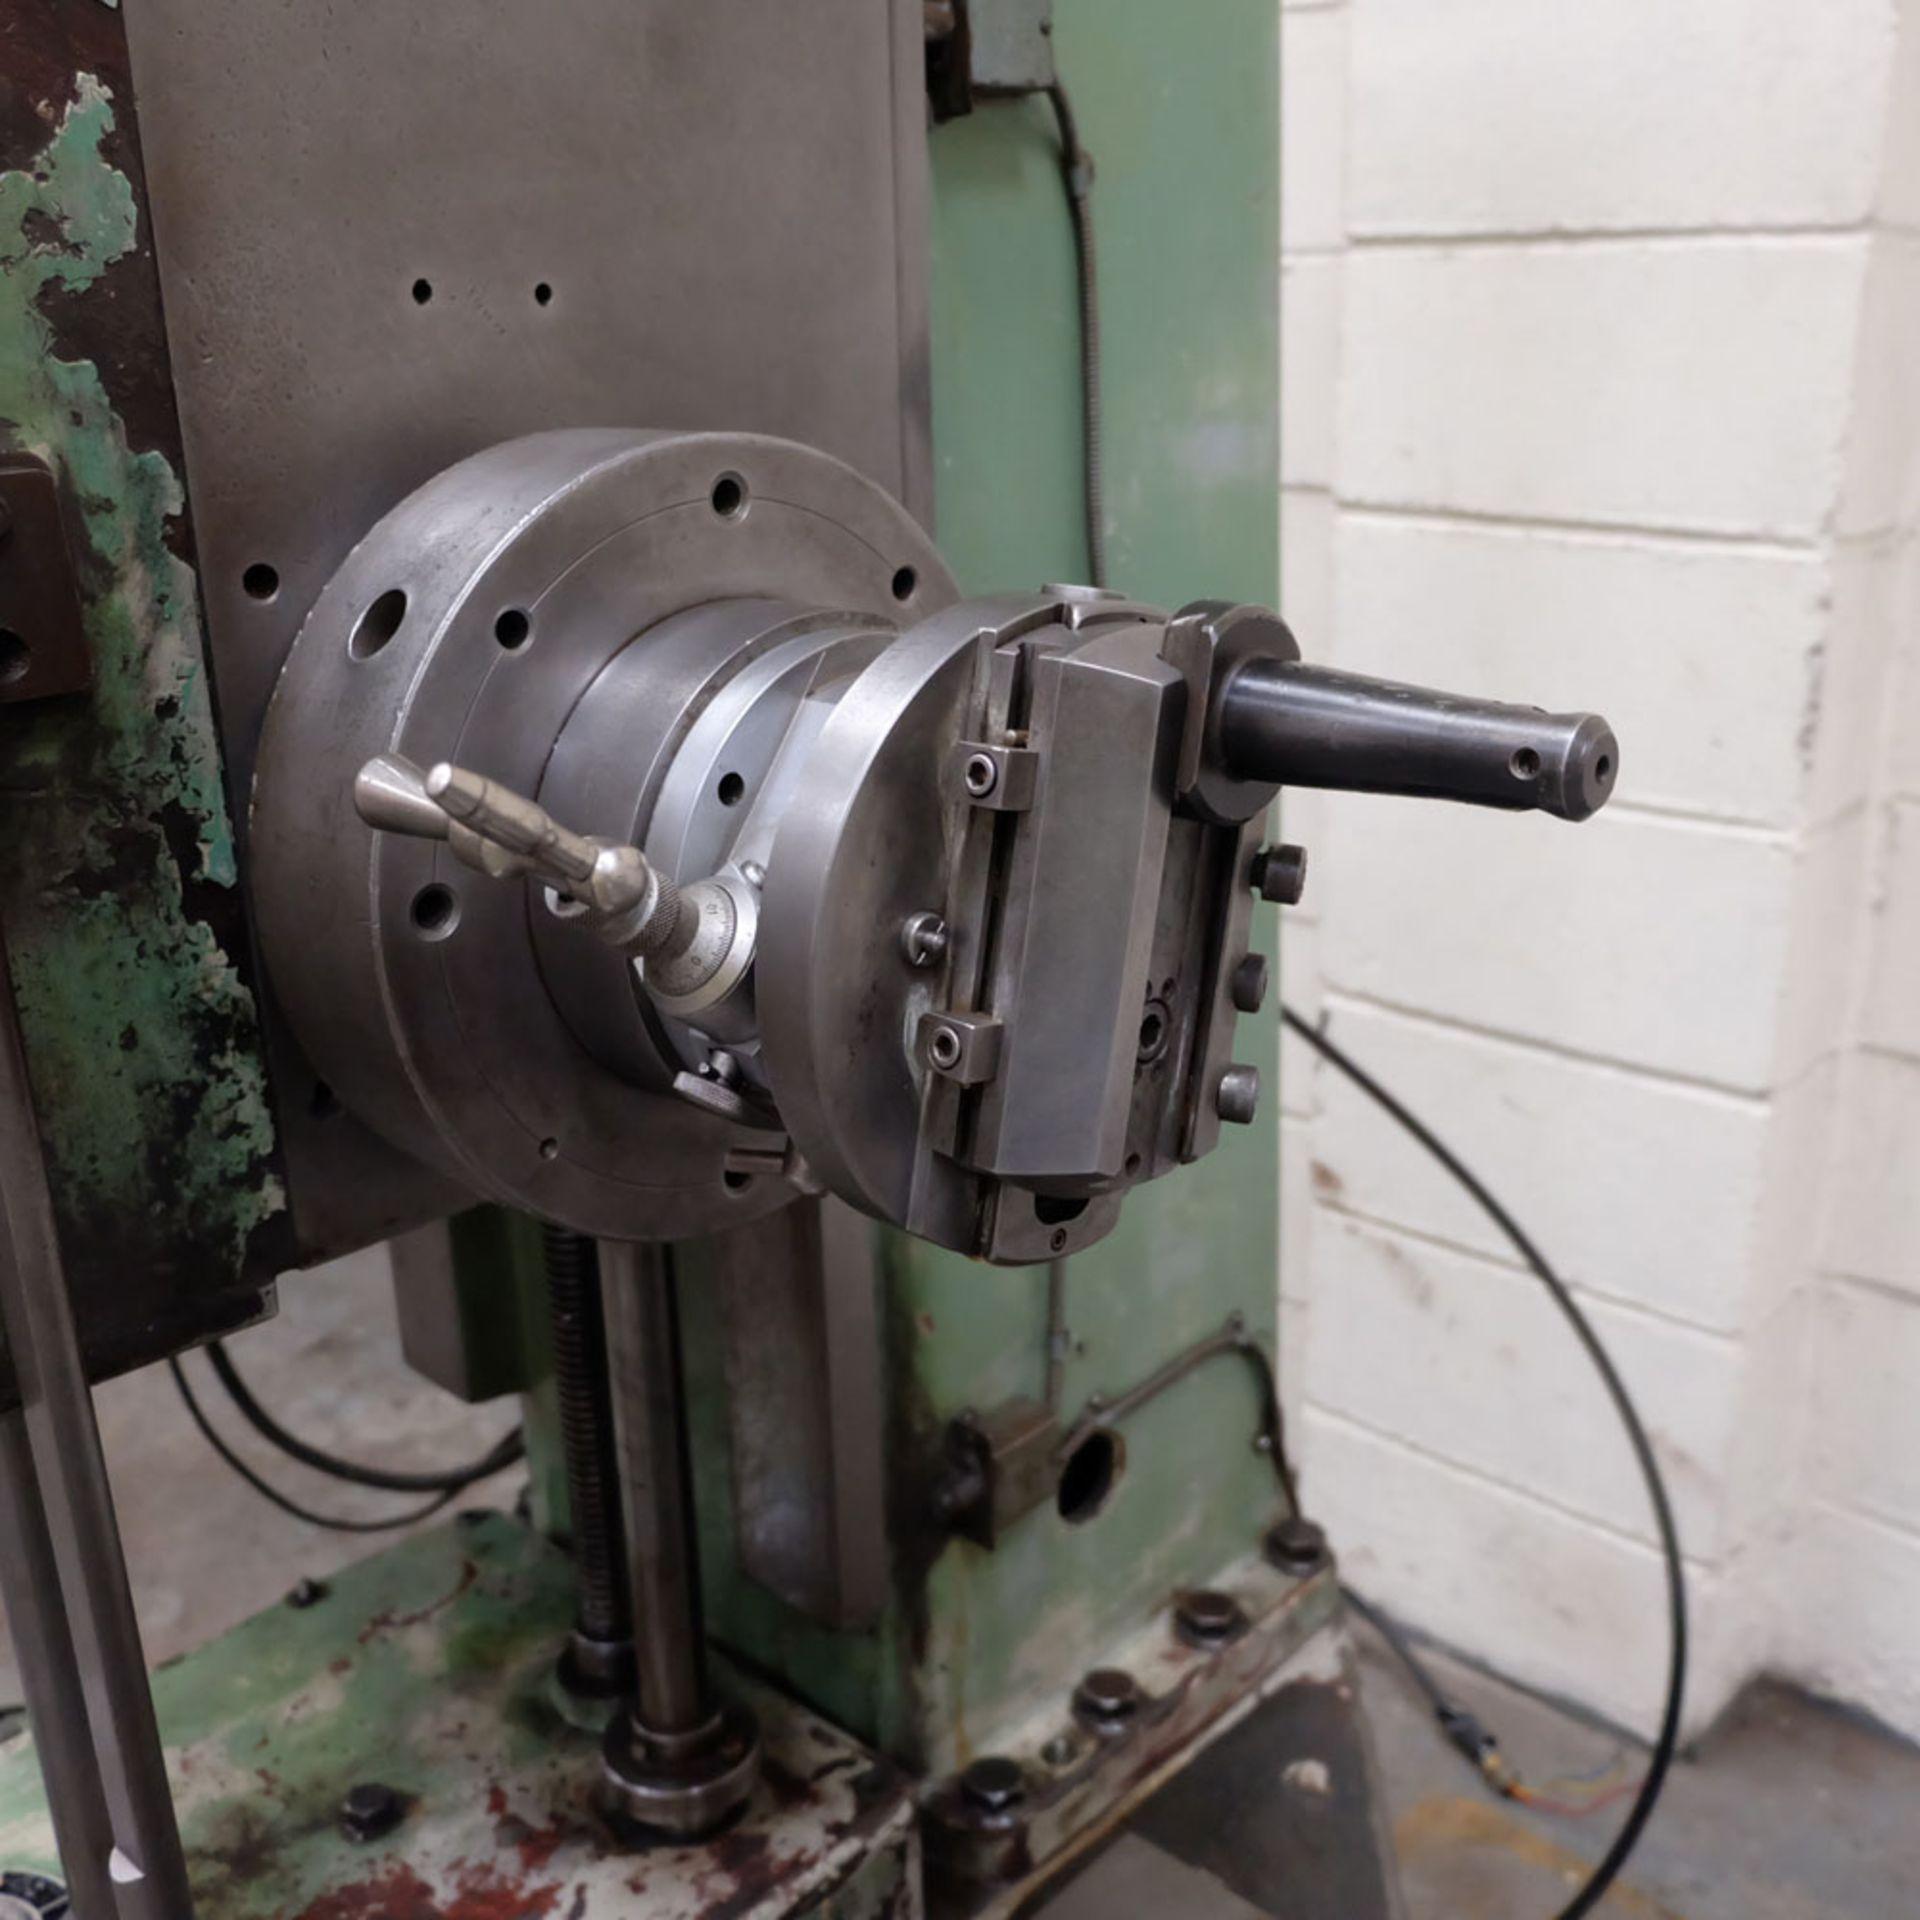 Juaristi Model MDR-55 Horizontal Boring Machine. Spindle Size: 55mm Dia. Spindle Bore: No.4 MT. - Image 9 of 14